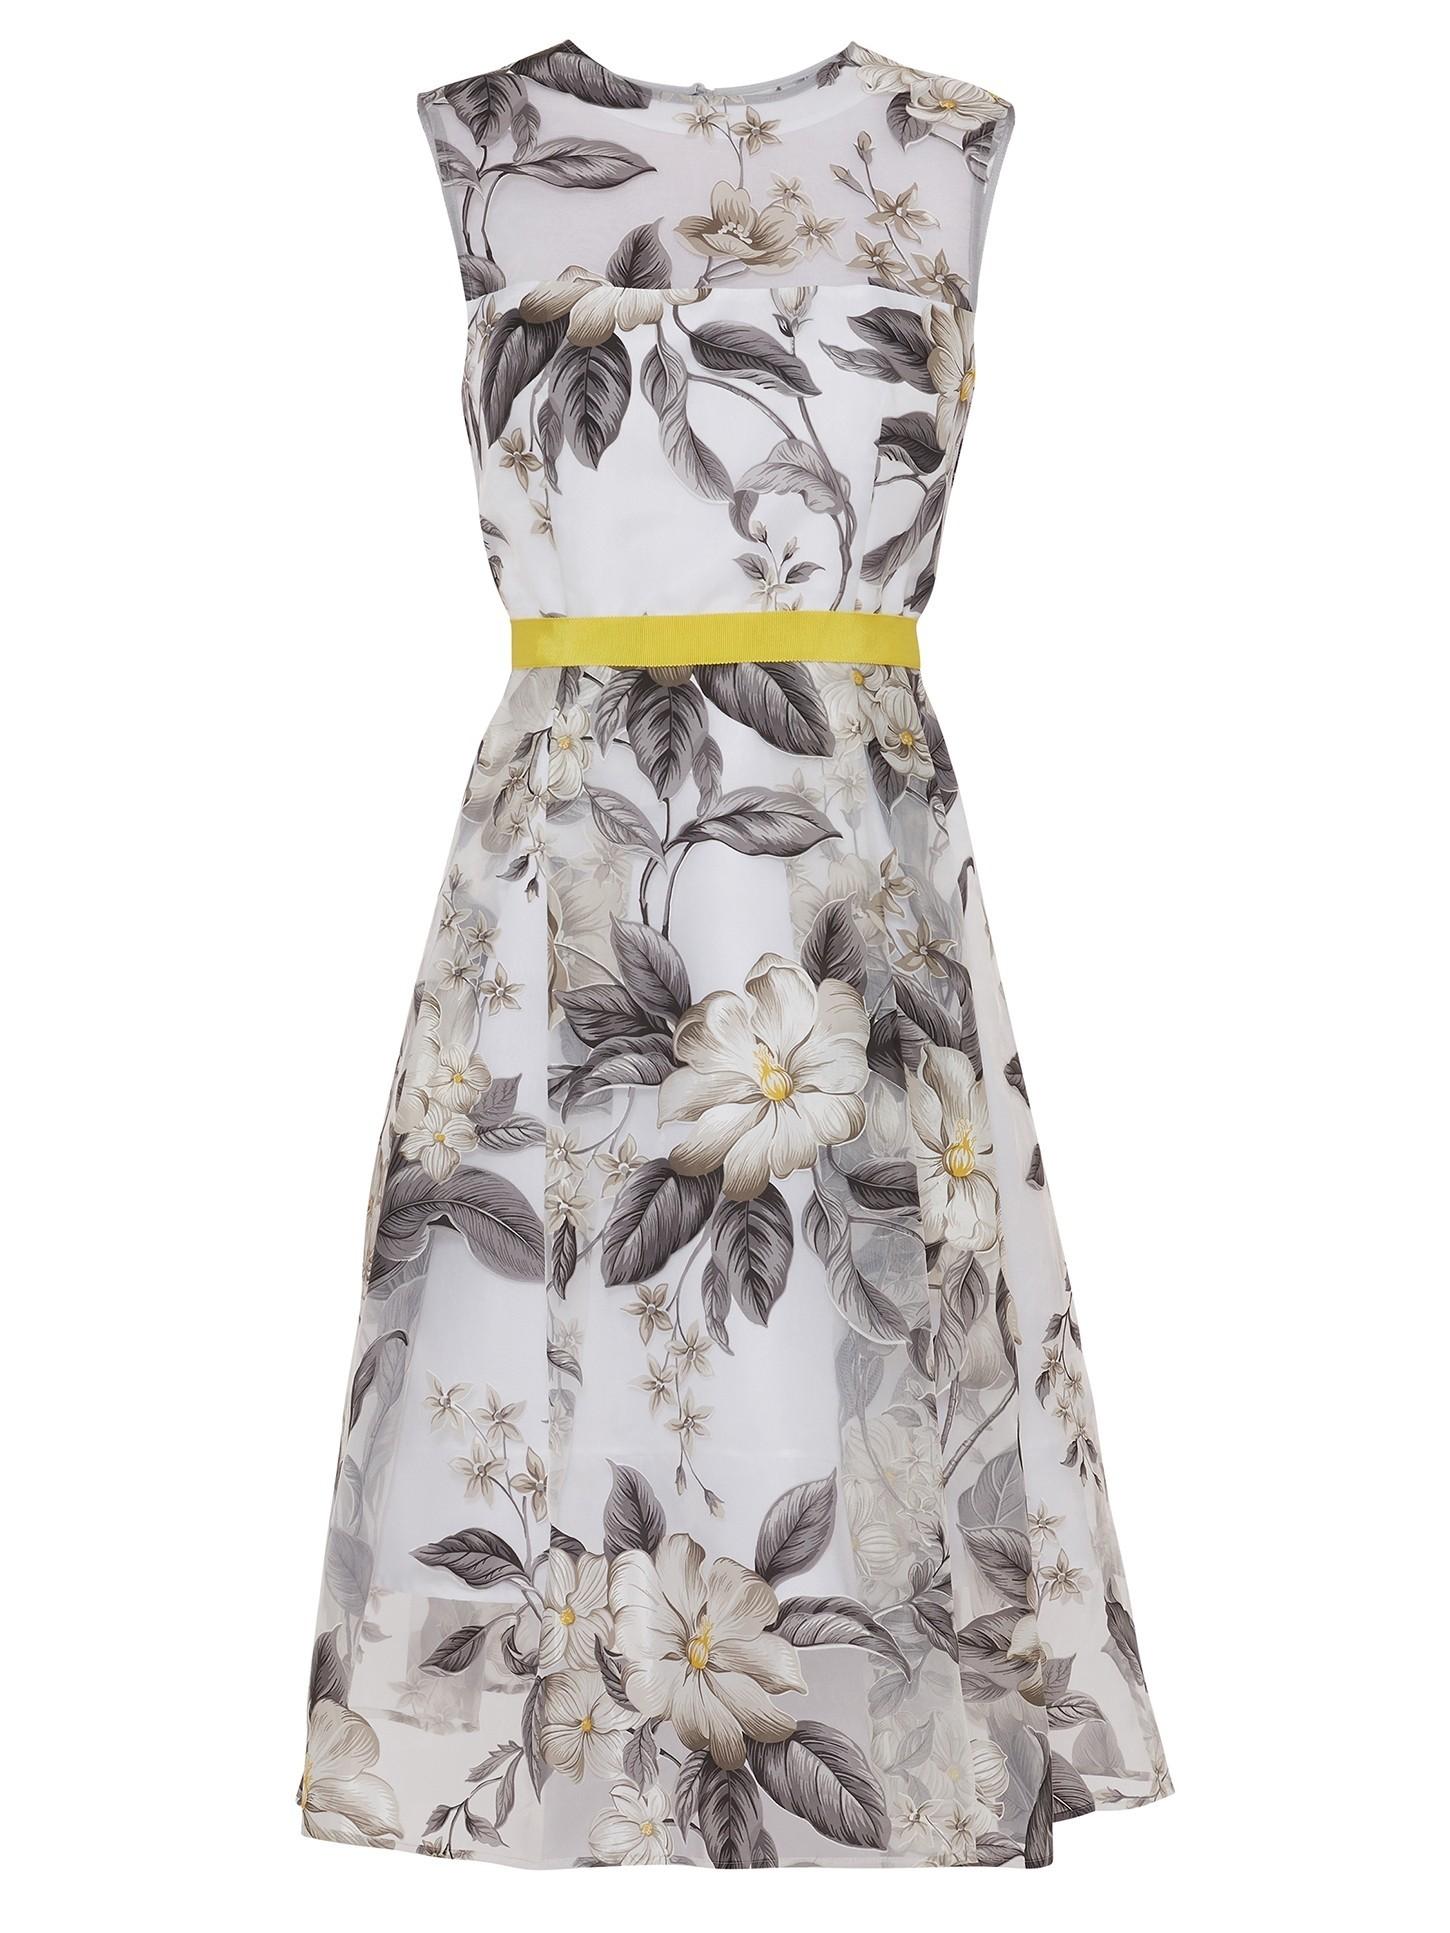 Fiora Floral Organza Dress